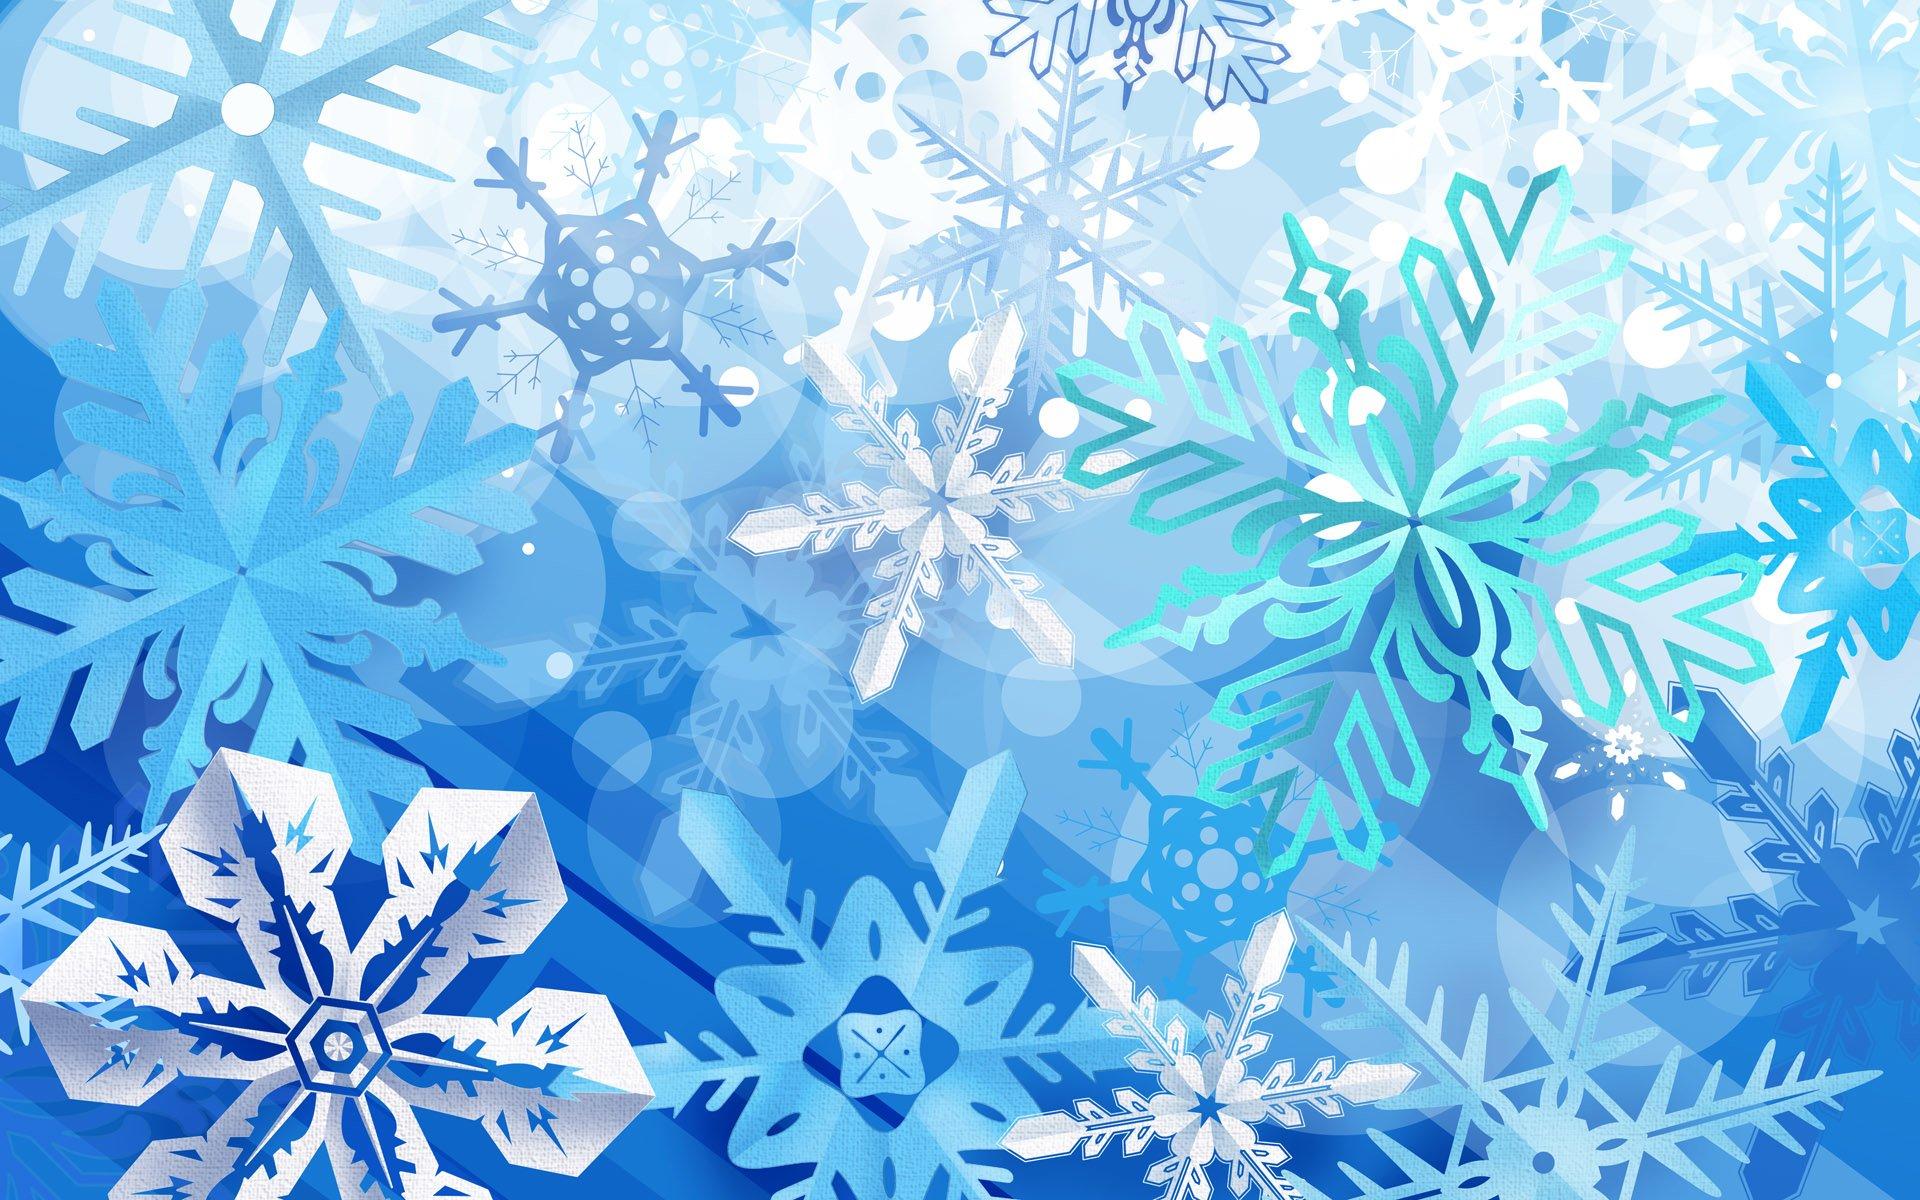 122 Snowflake HD Wallpapers